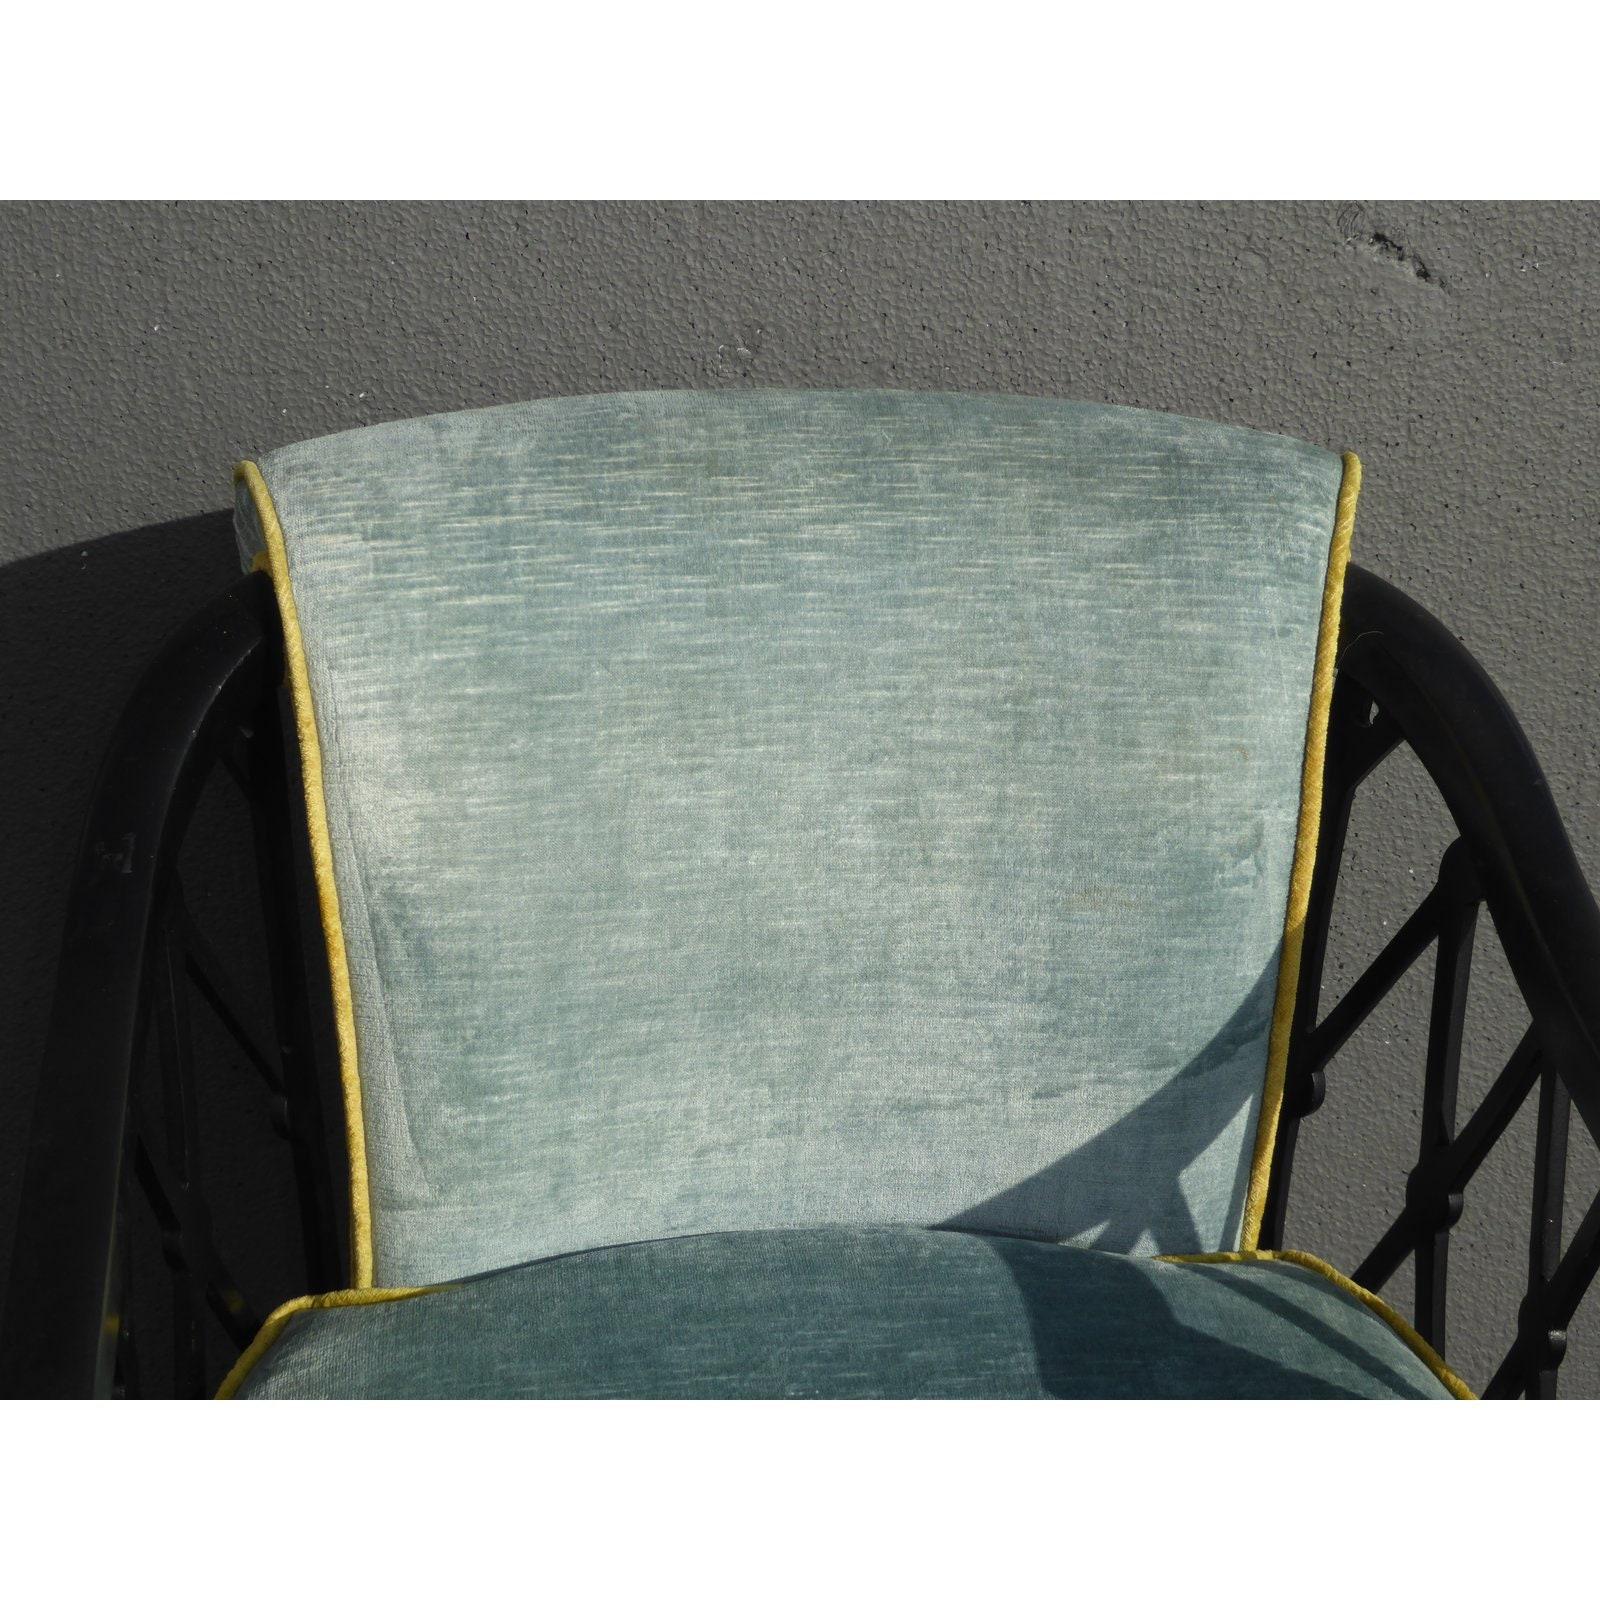 vintage black gold hollywood regency accent chair with blue velvet upholstery. Black Bedroom Furniture Sets. Home Design Ideas